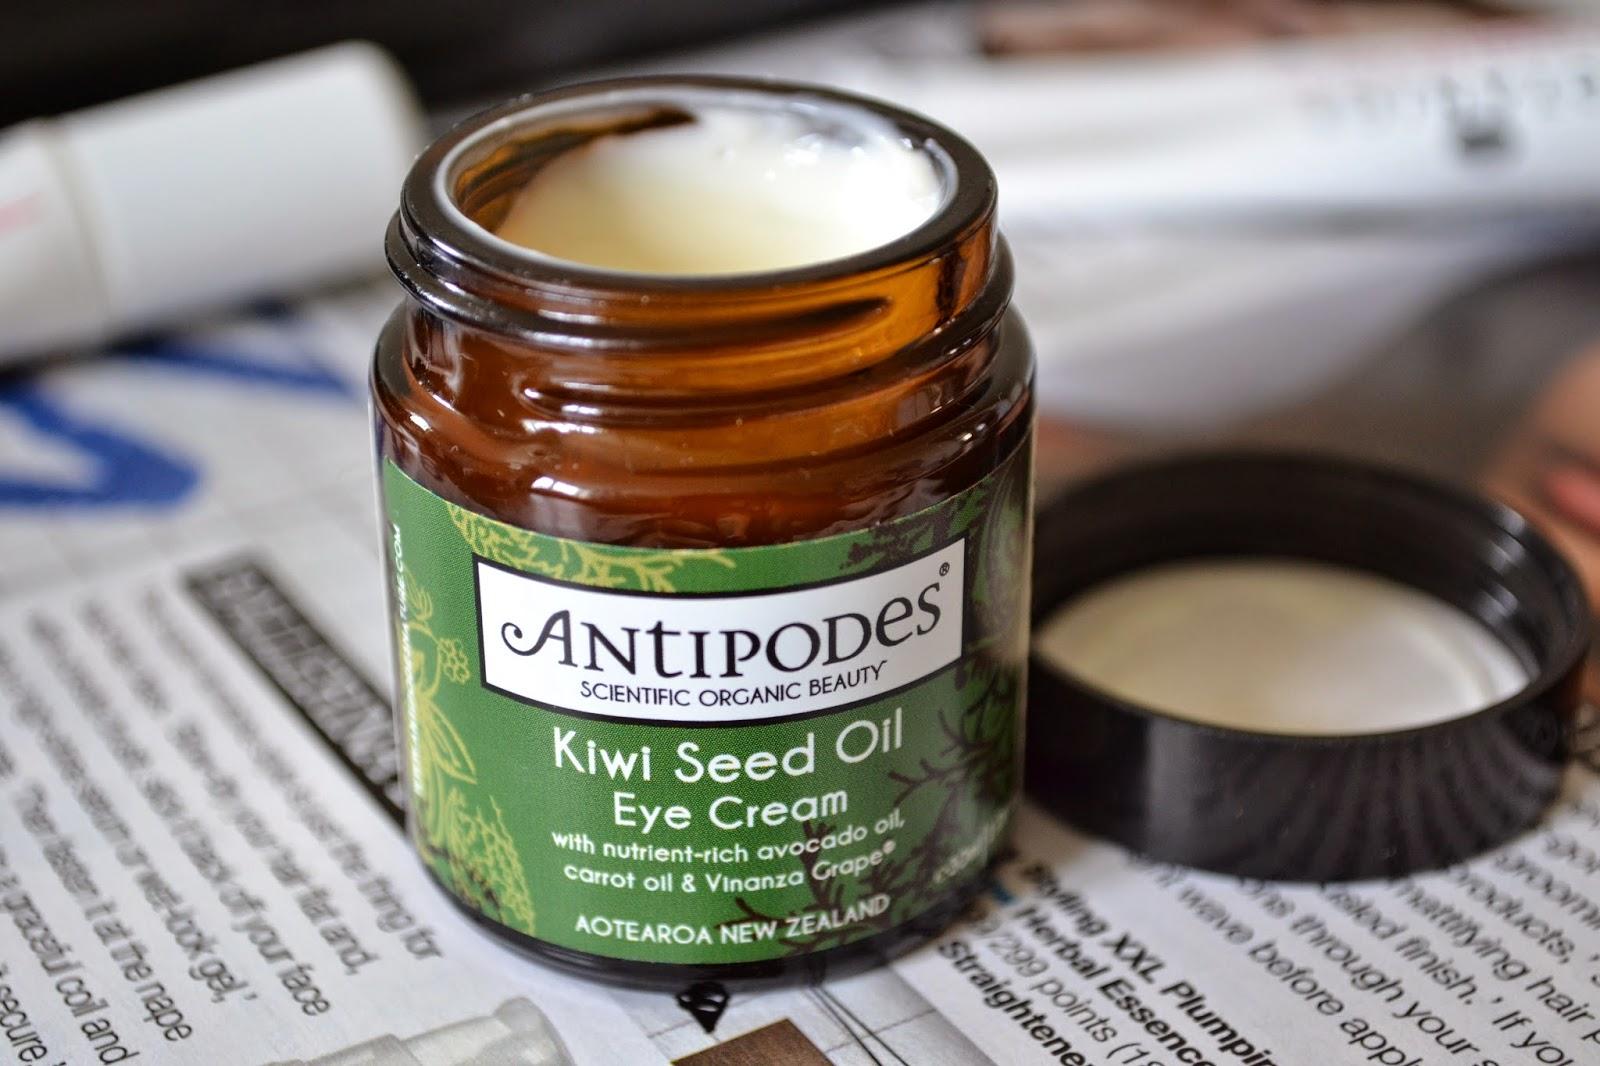 Eye Creams 101 | Aspiring Londoner